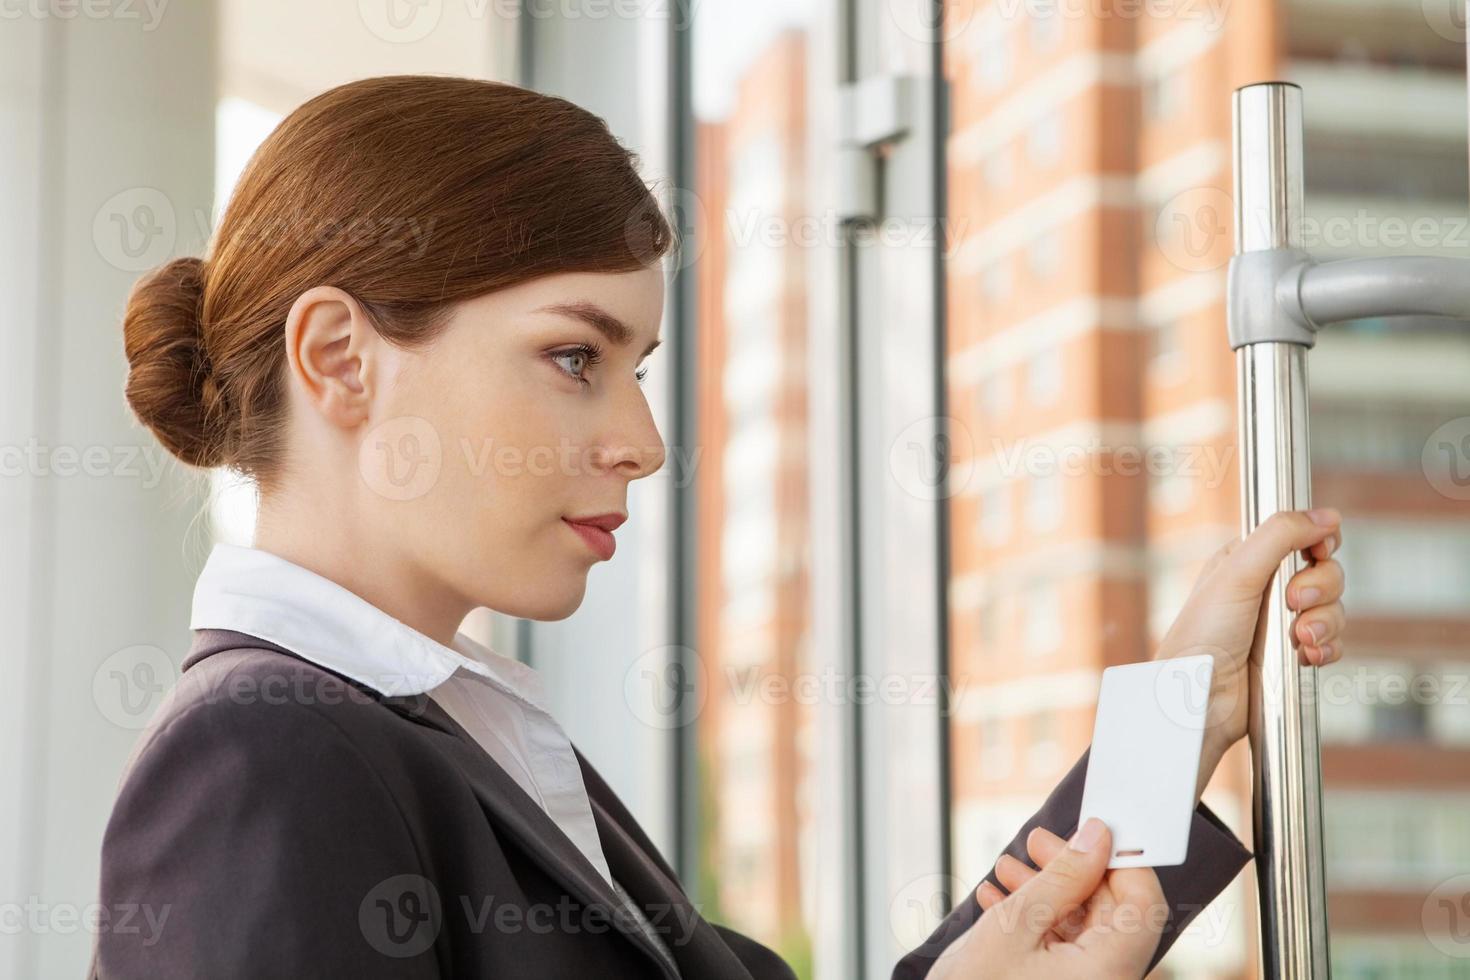 Woman uses electronic pass. photo